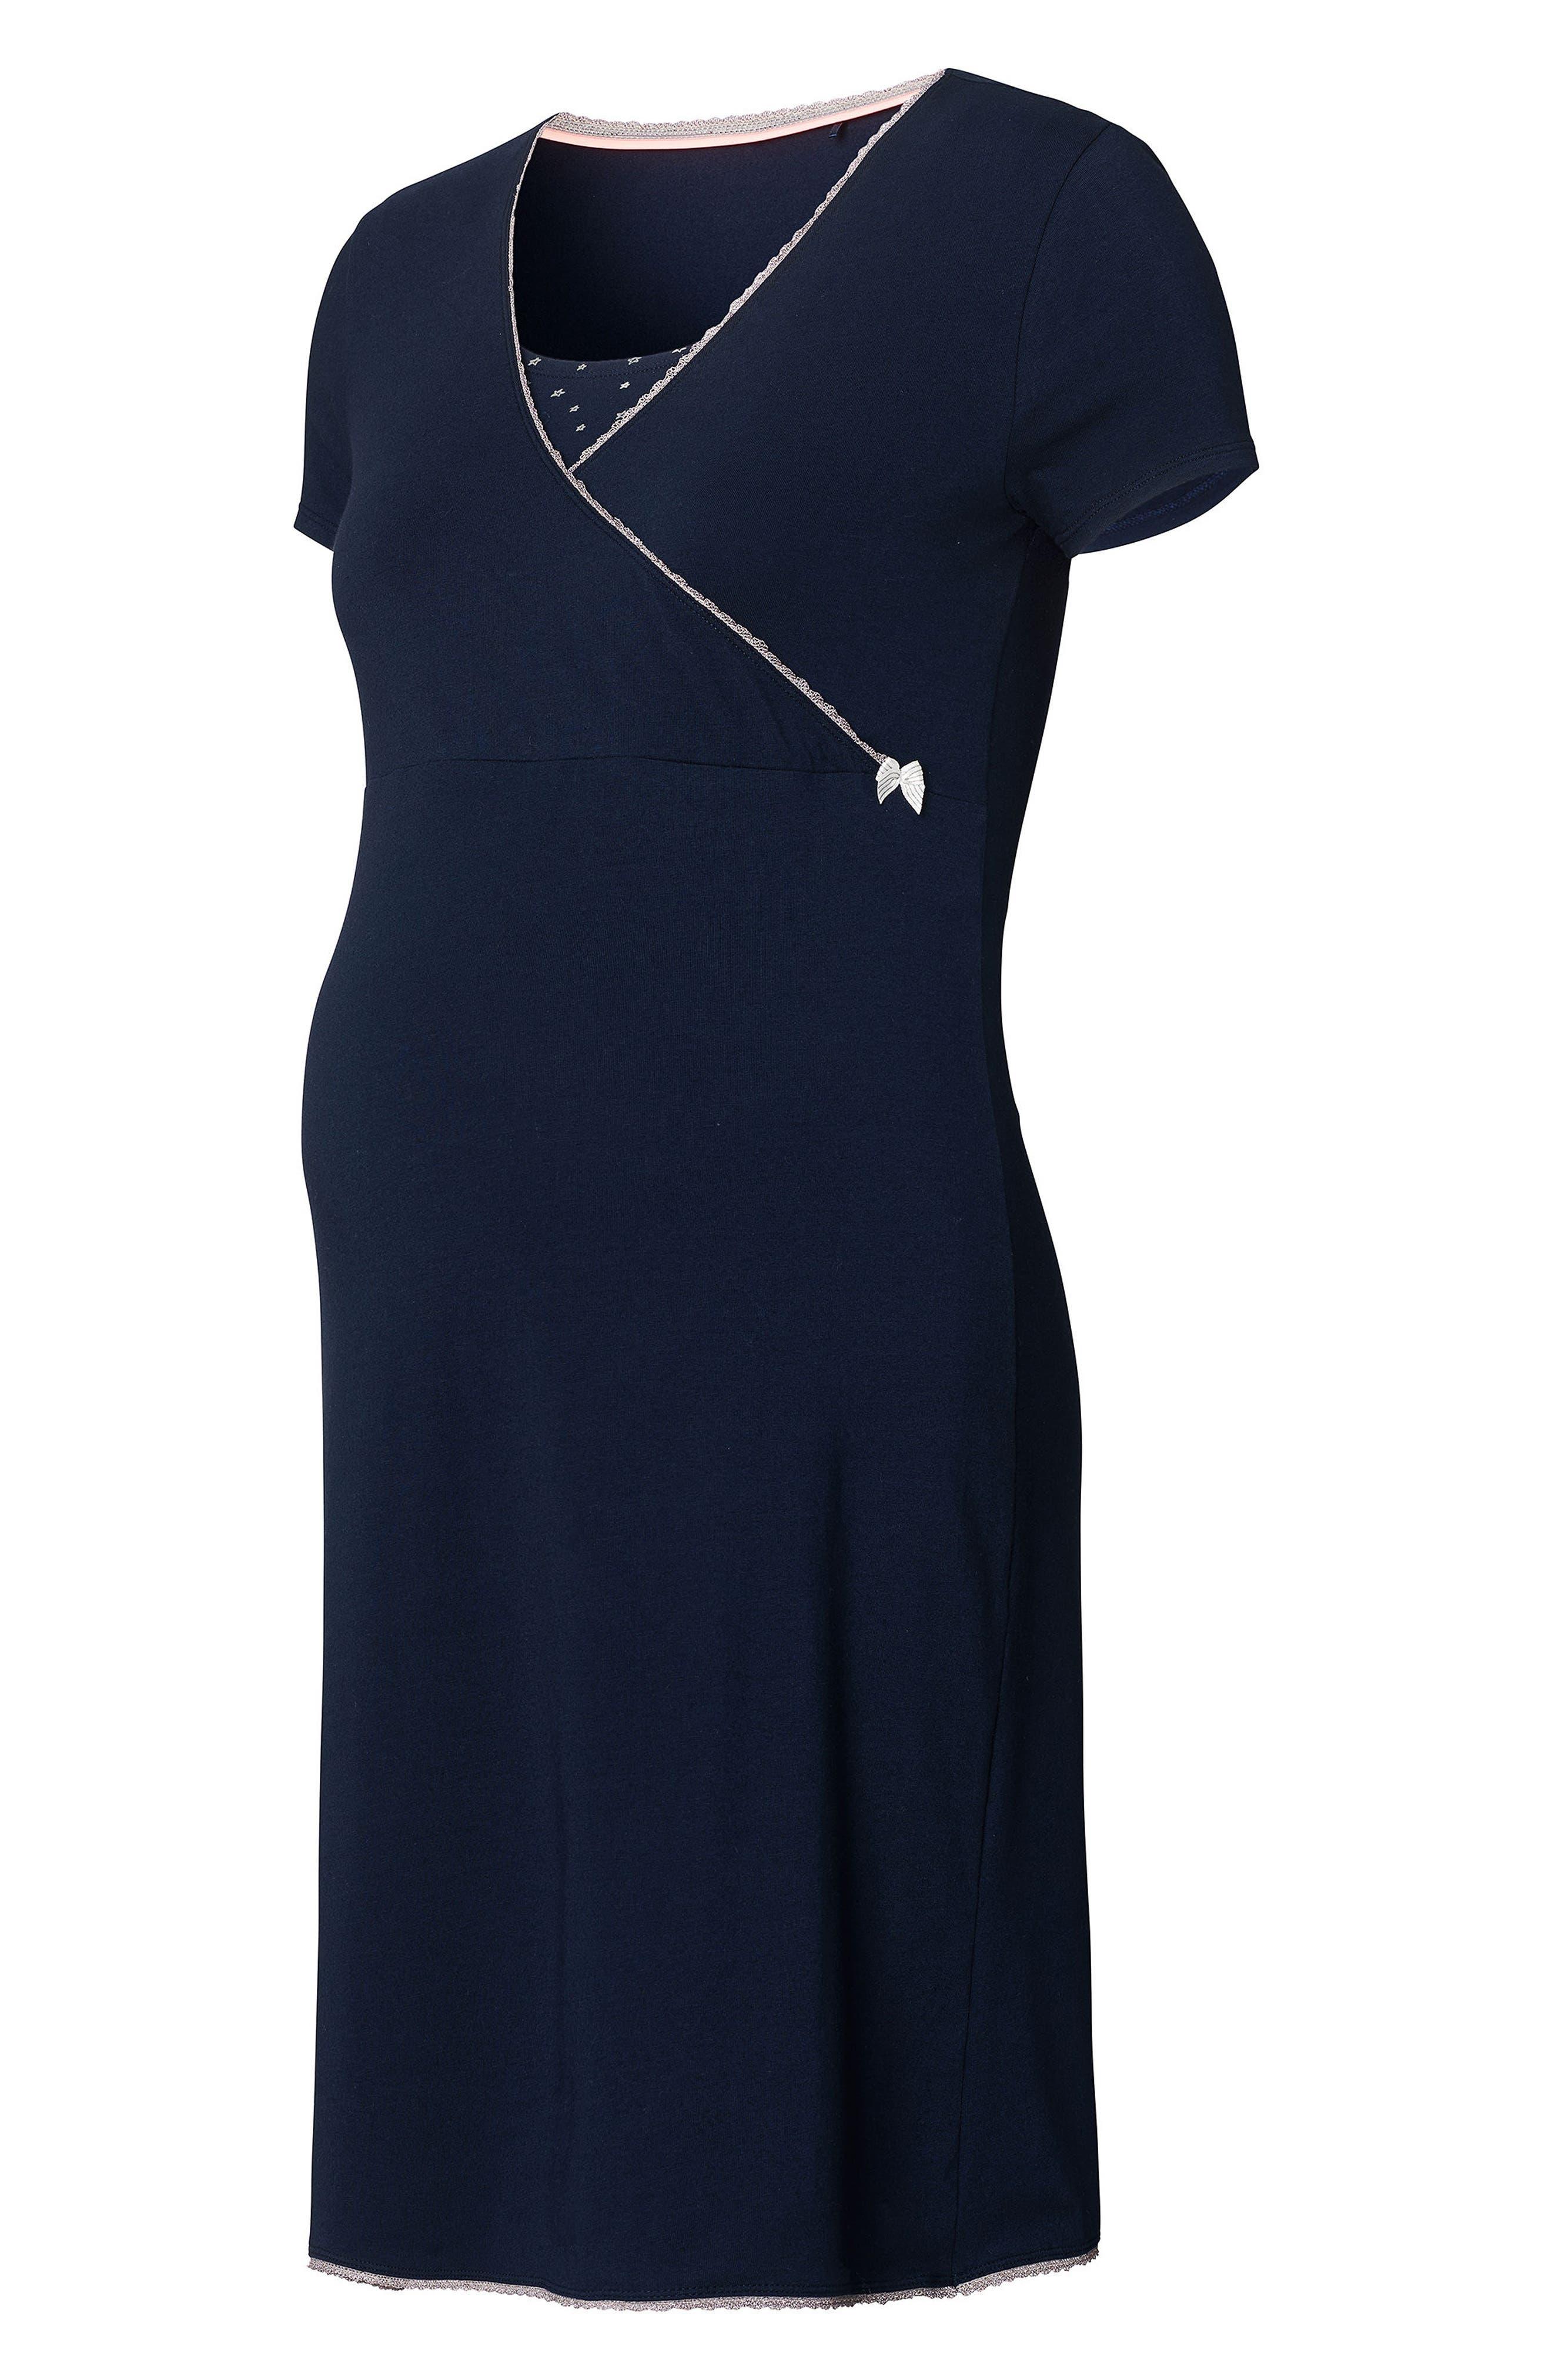 Kimm Maternity/Nursing Jersey Dress,                             Alternate thumbnail 3, color,                             Blue